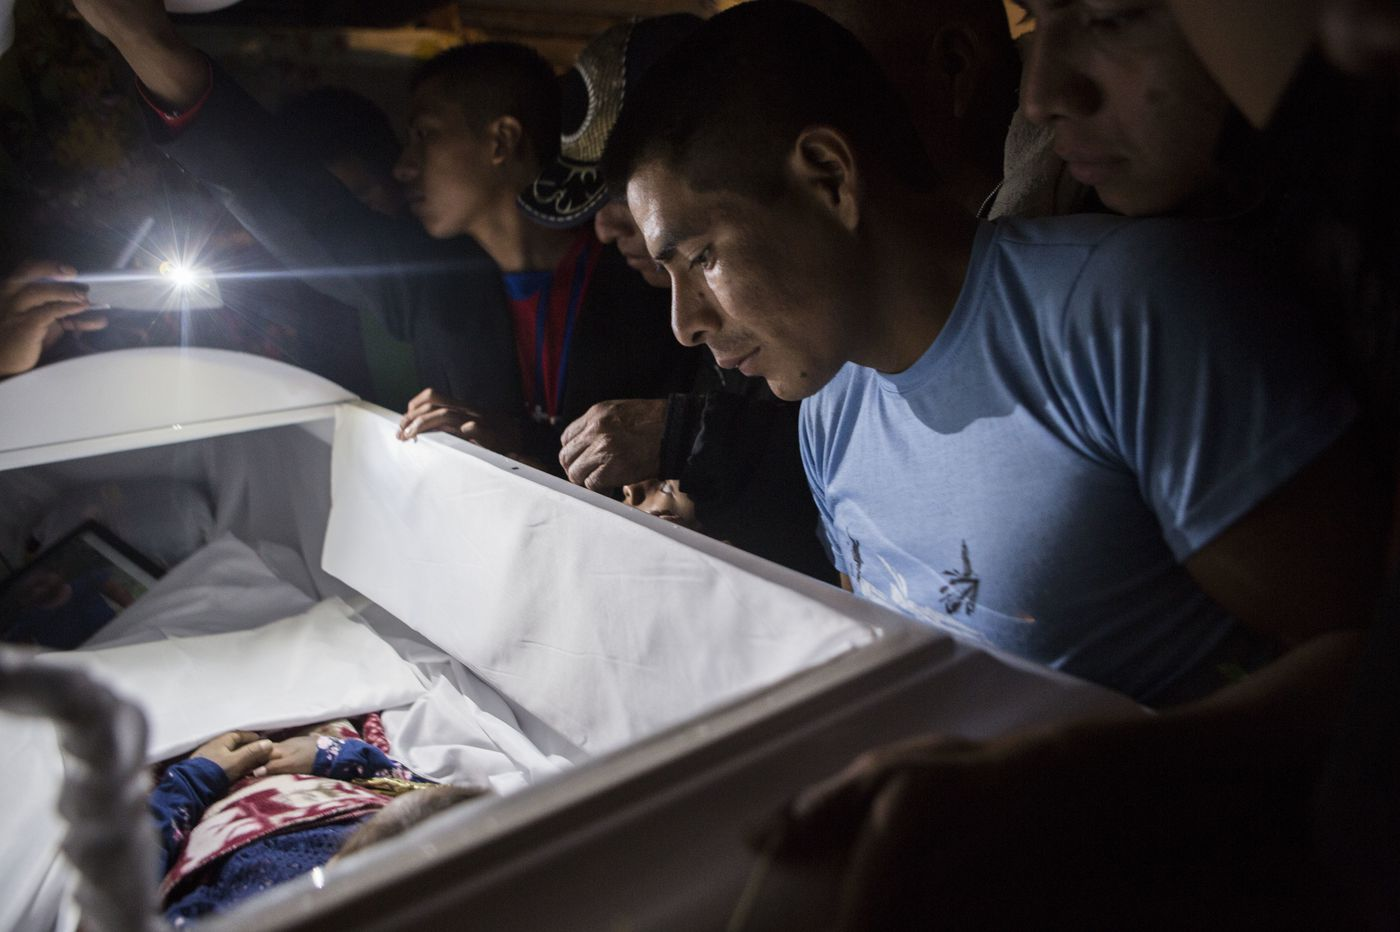 A tragic journey home: migrant girl's body back in Guatemala